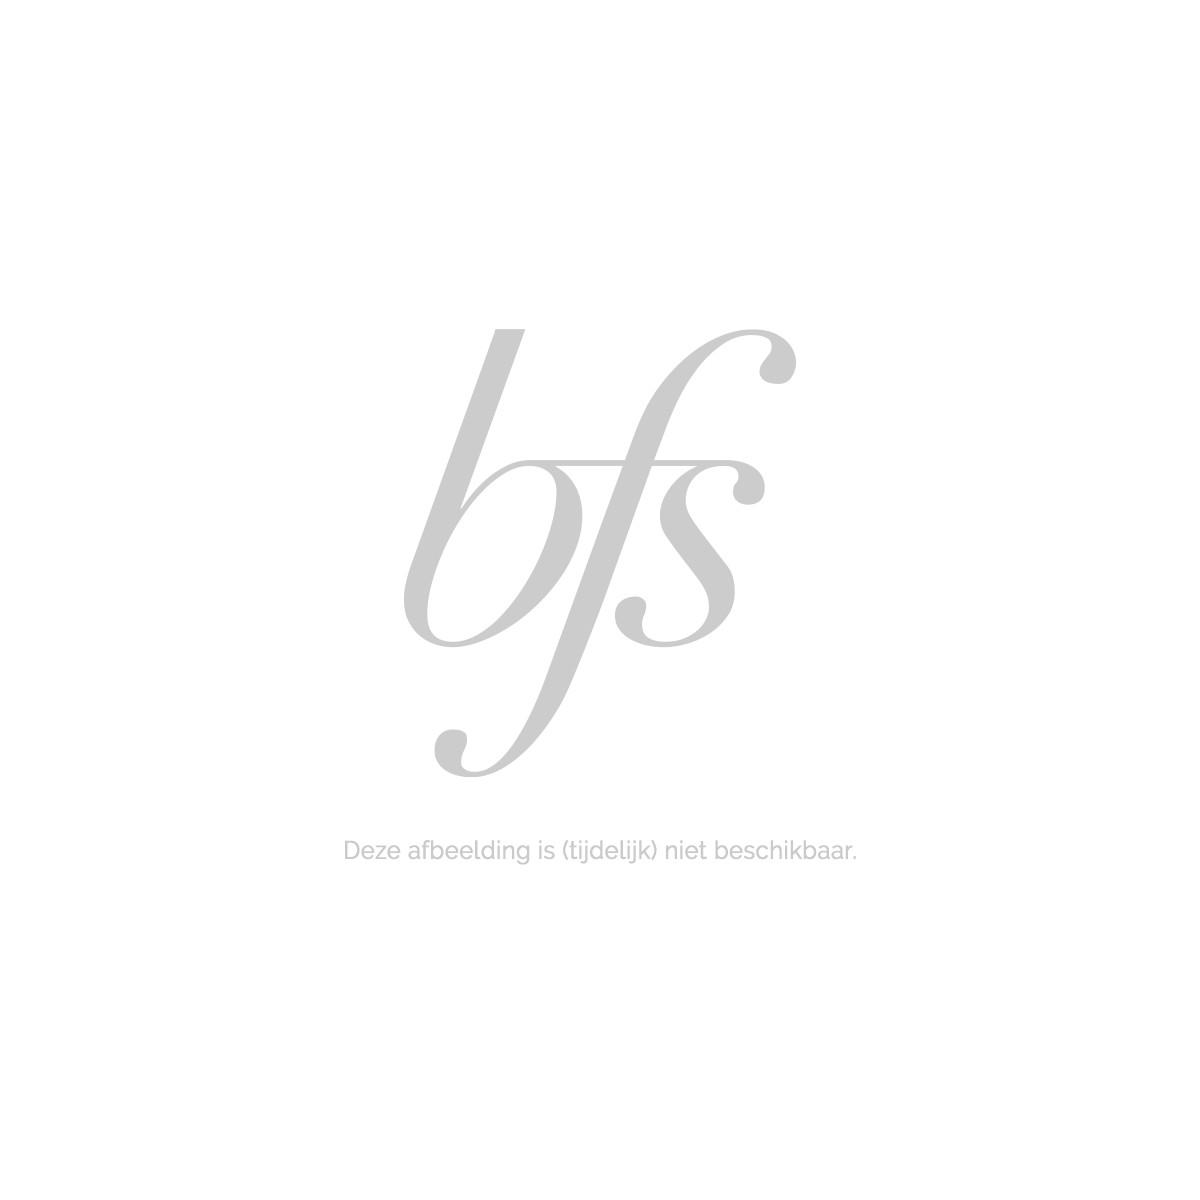 Ibp Thin Straight Wood File 220/220 1